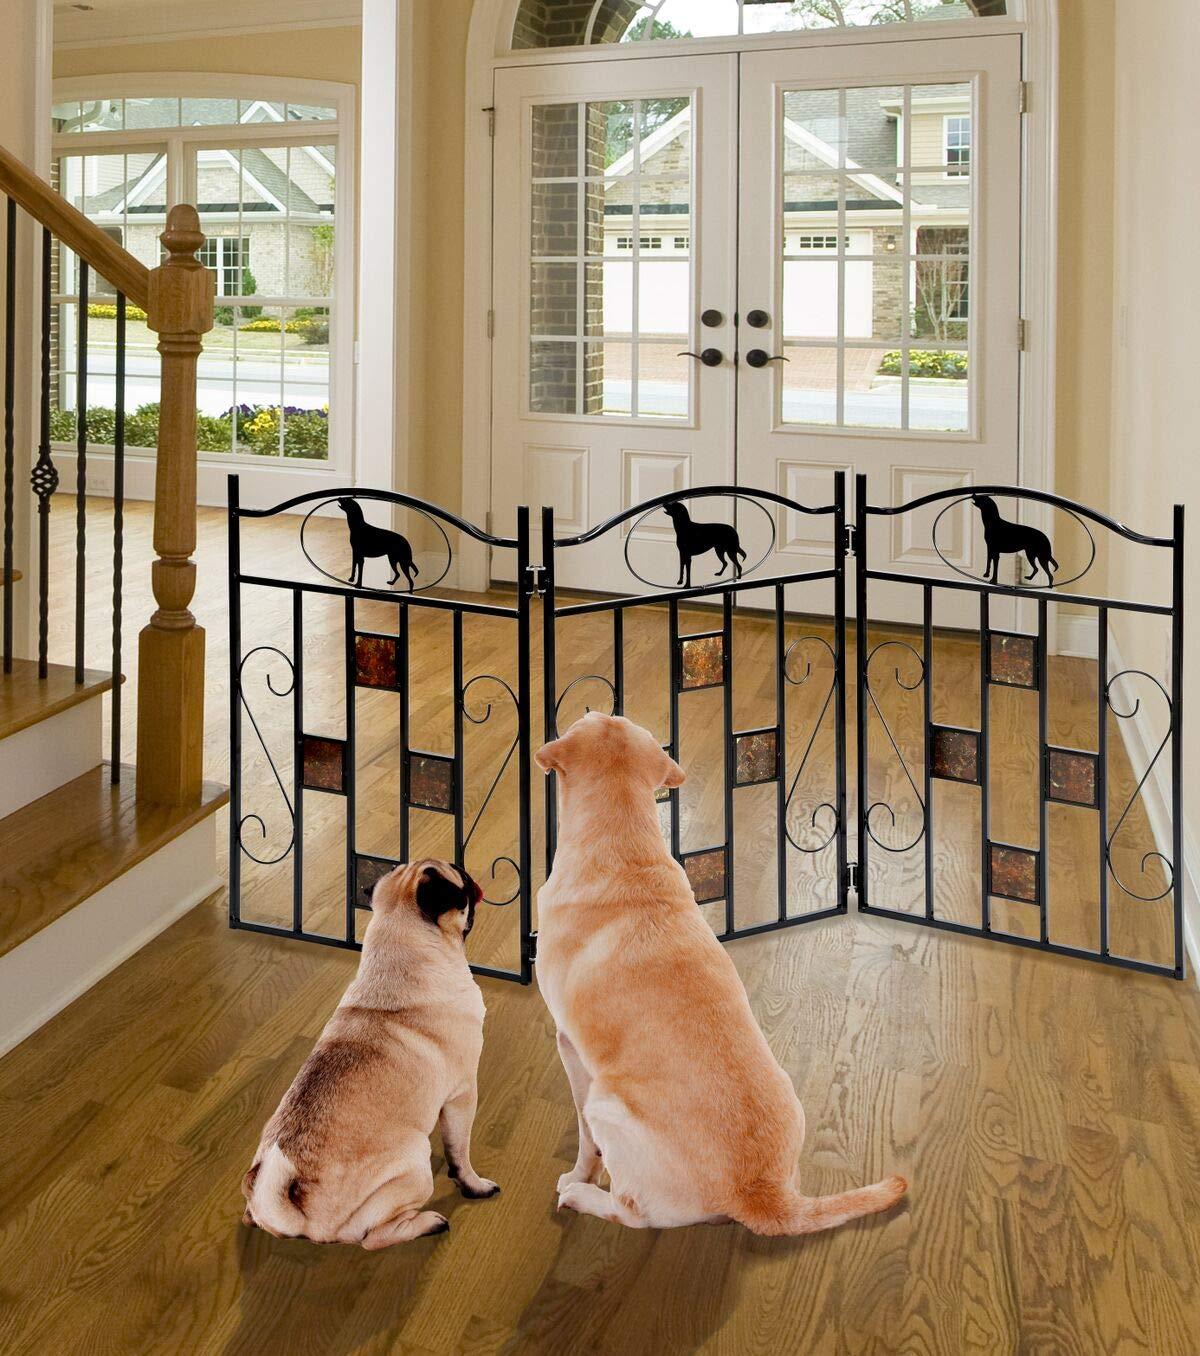 Artistic Design Adjustable & Folding Metal Pet Gate (Freestanding)   Extended Size 50''W x 23.5''H